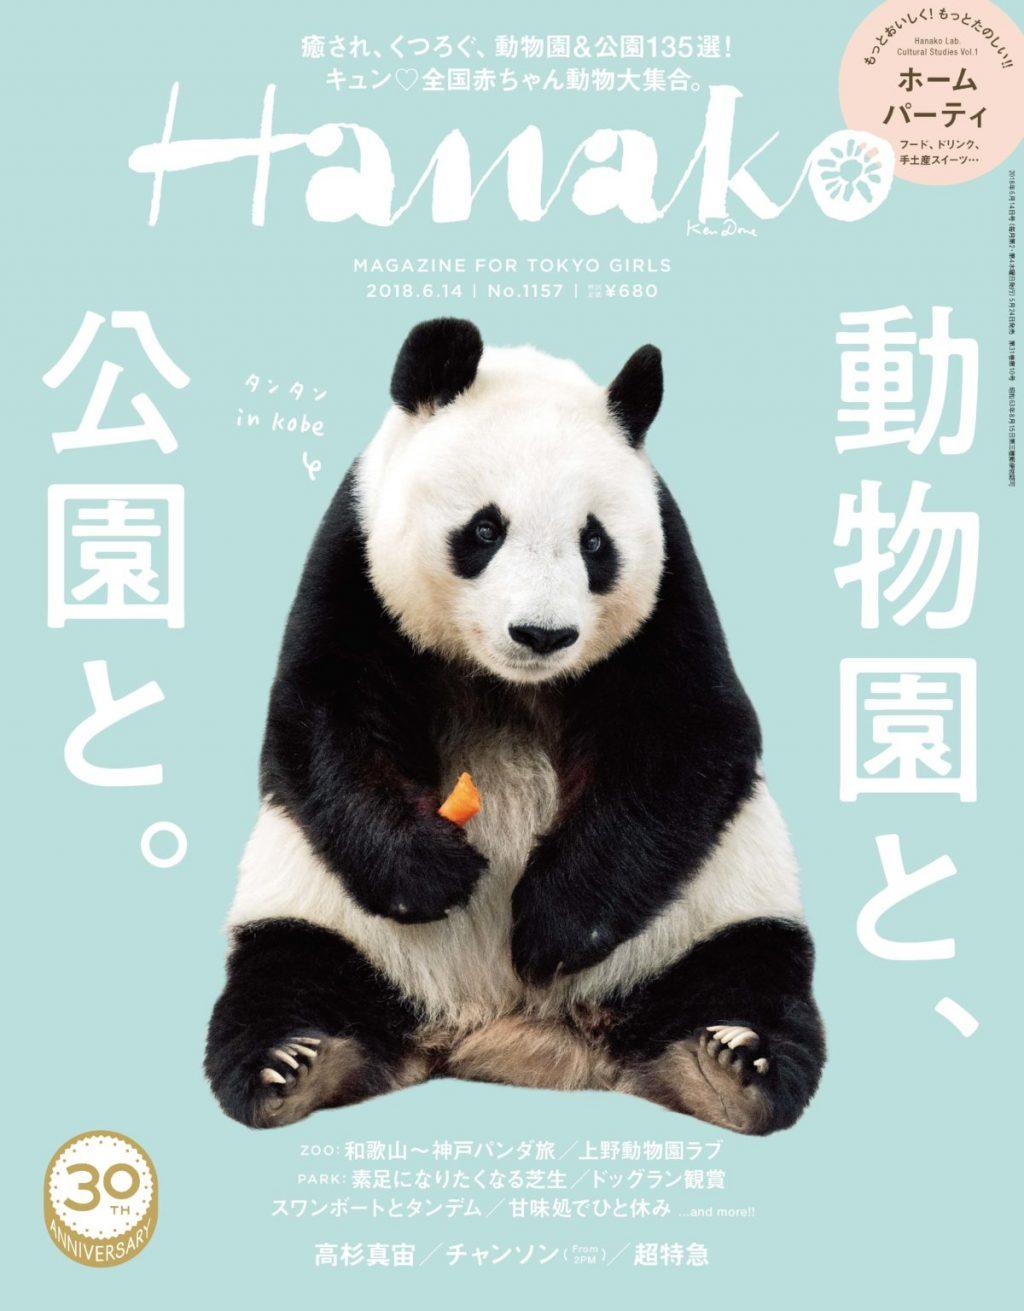 "<span class=""catchcopy"">No. 1157<br> 癒され、くつろぐ… 初夏の東京アウトドア</span><span class=""title"">動物園と、公園と。</span>"